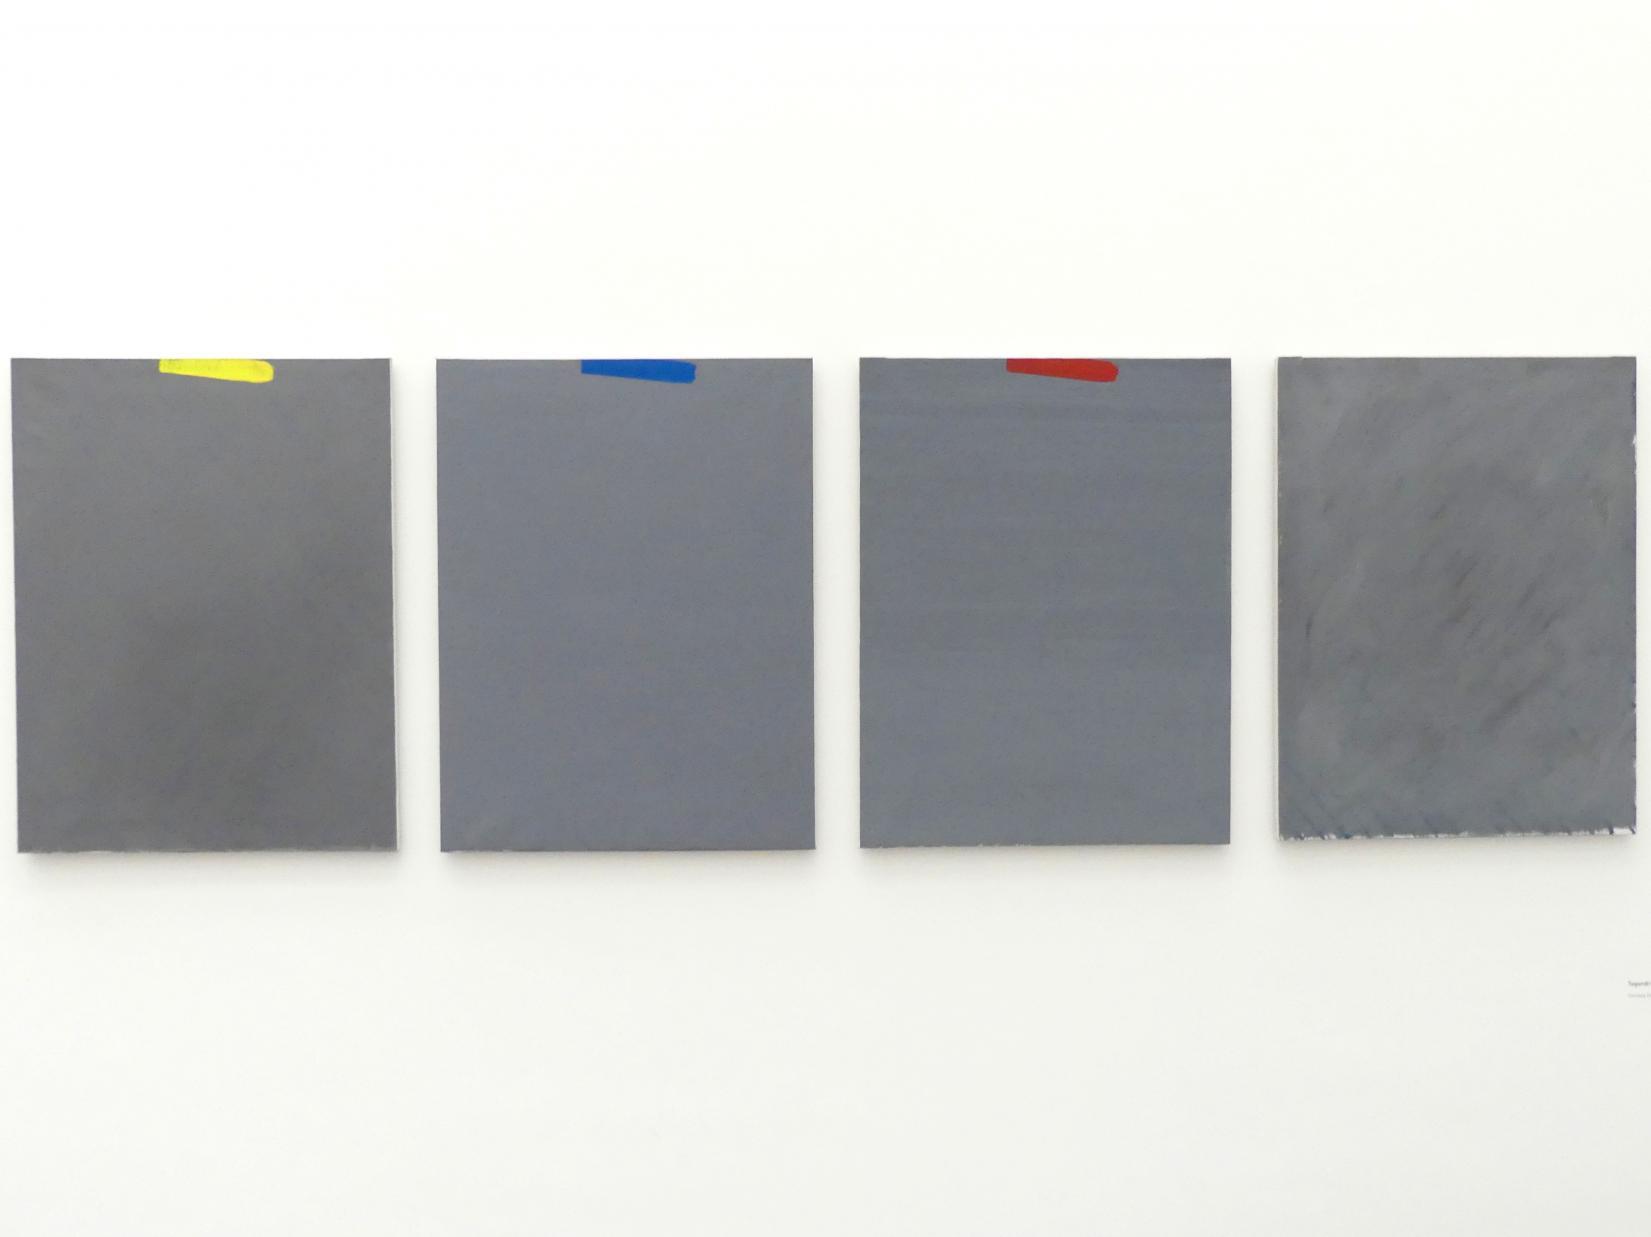 Raoul De Keyser: Tegendraads - Gegenüber, 1978